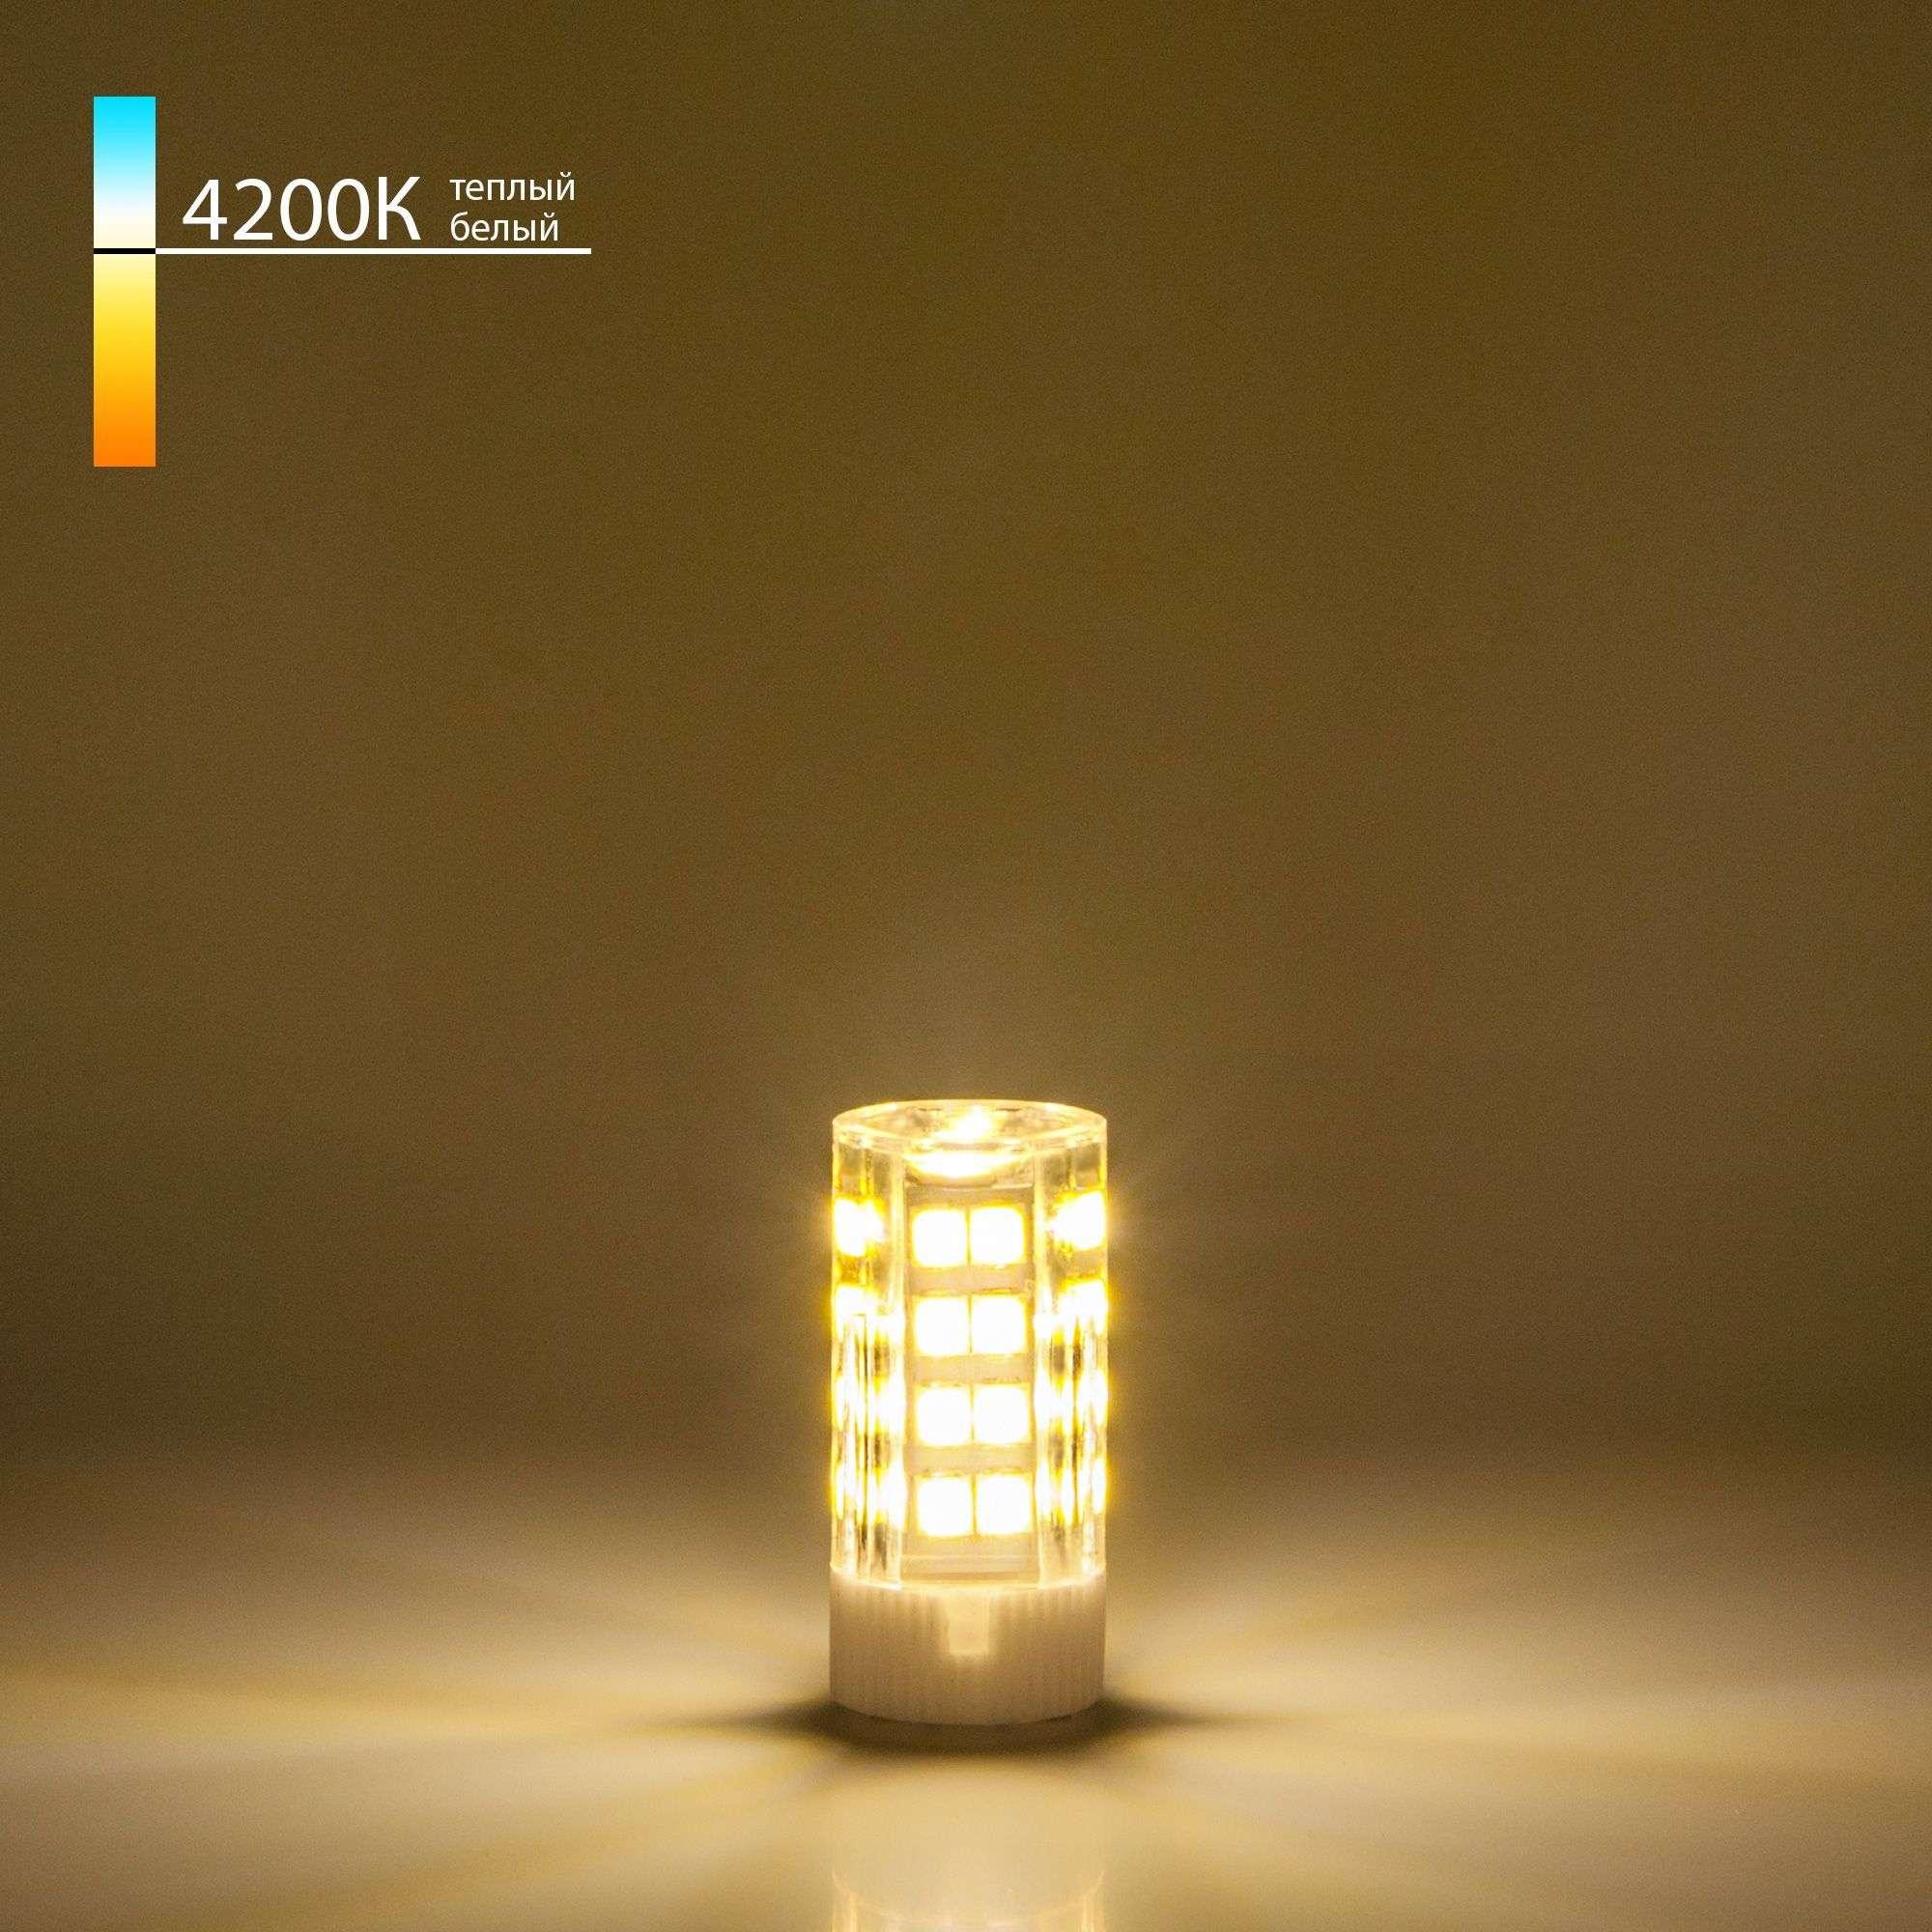 Cветодиодная лампа 7W 4200K G4 G4 LED BL108 7W 220V 4200K